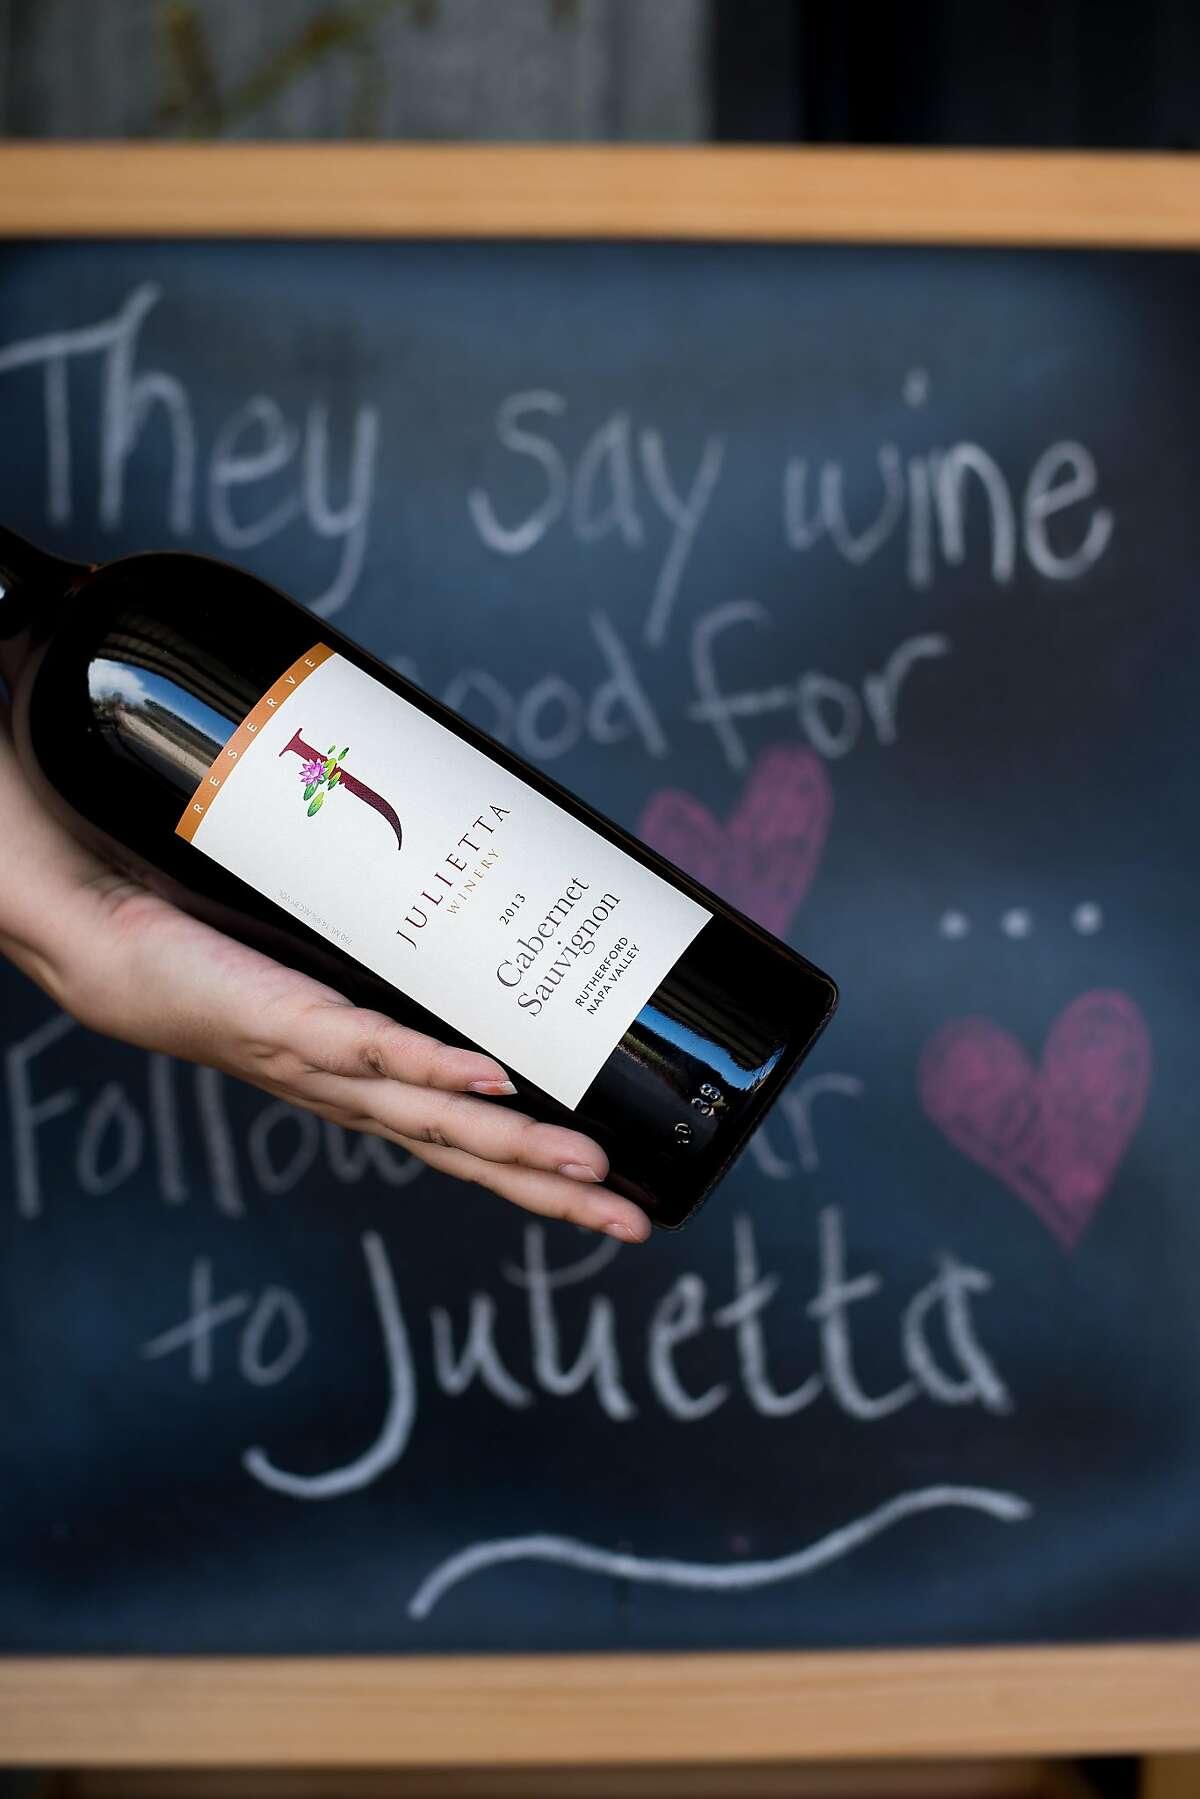 Kirsten Palmer displays a bottle of Cabernet Sauvignon at Julietta Winery in Clarksburg, Calif., on Saturday, March 11, 2017.